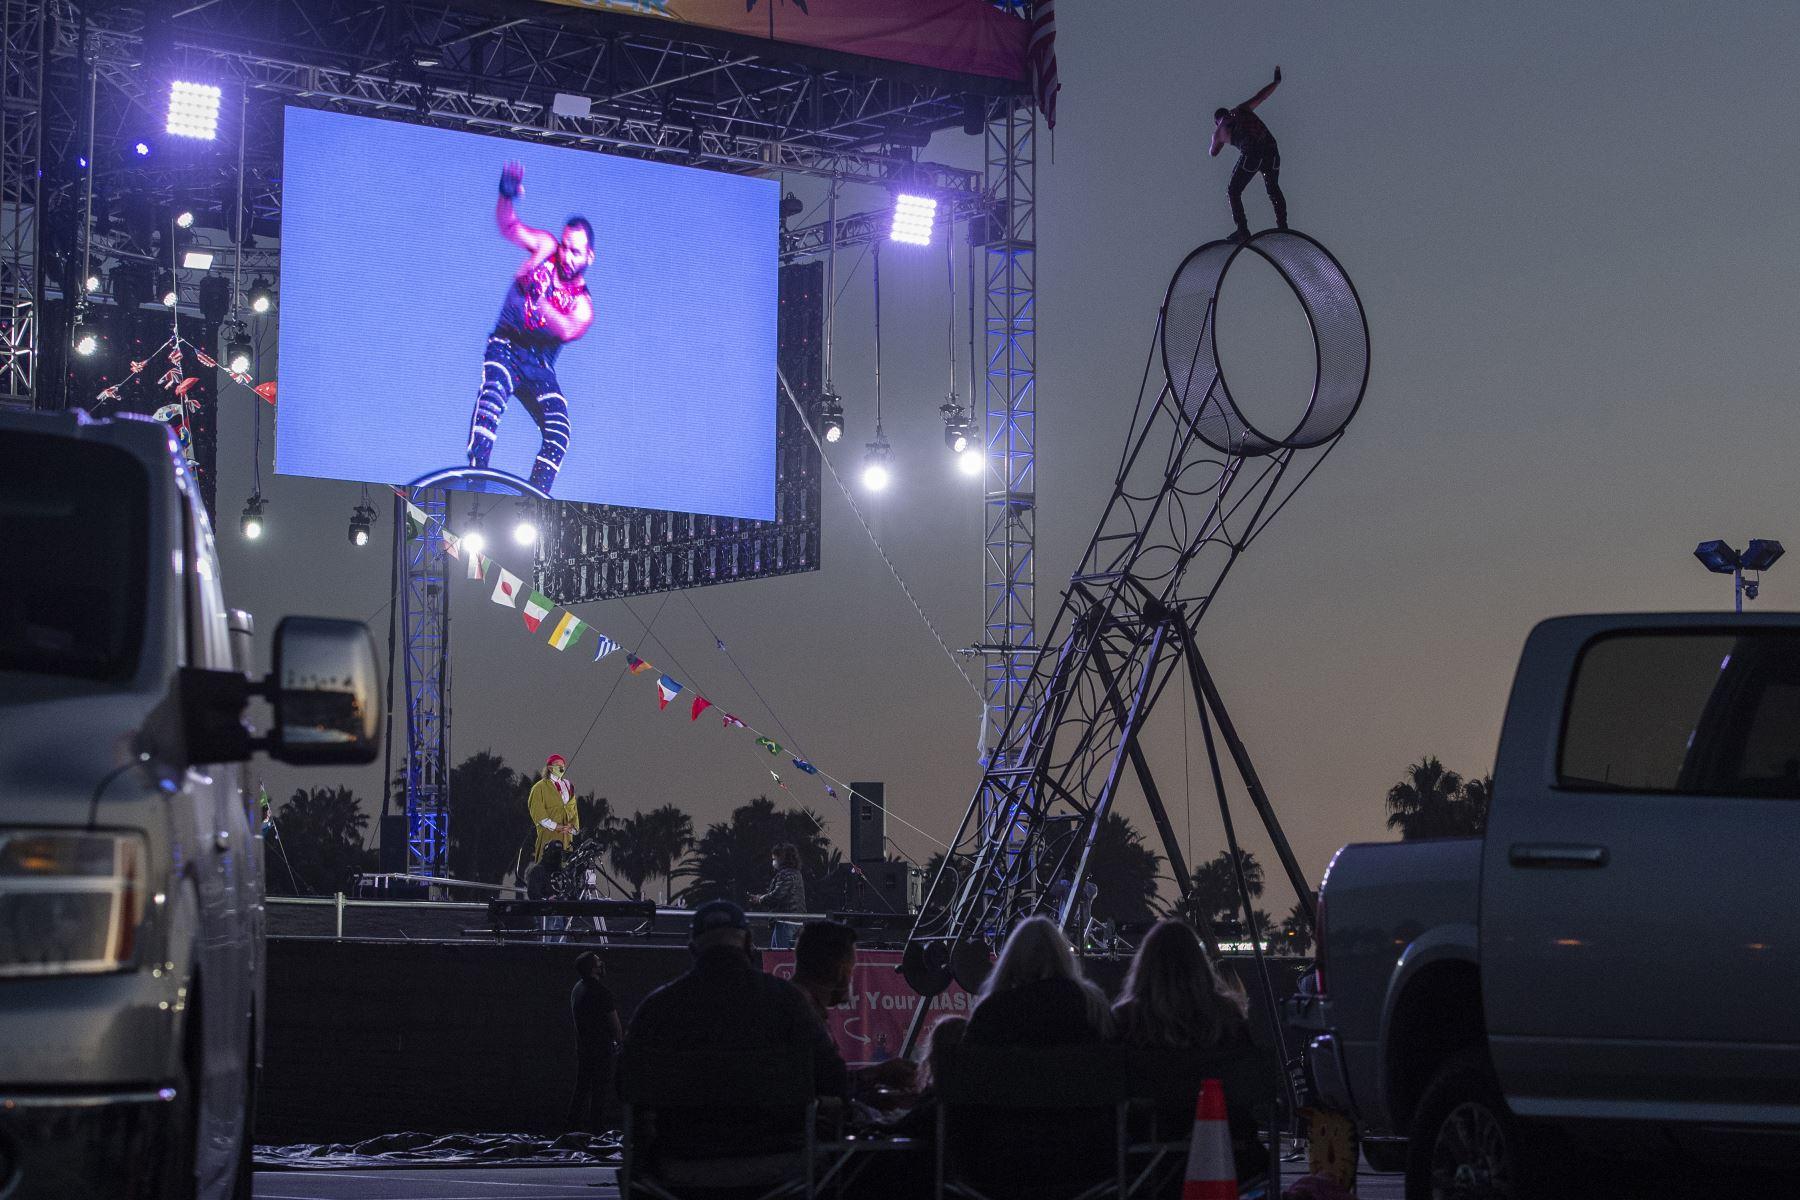 Un acróbata del Zoppe Italian Family Circus realiza un espectacular acto durante el evento en vivo